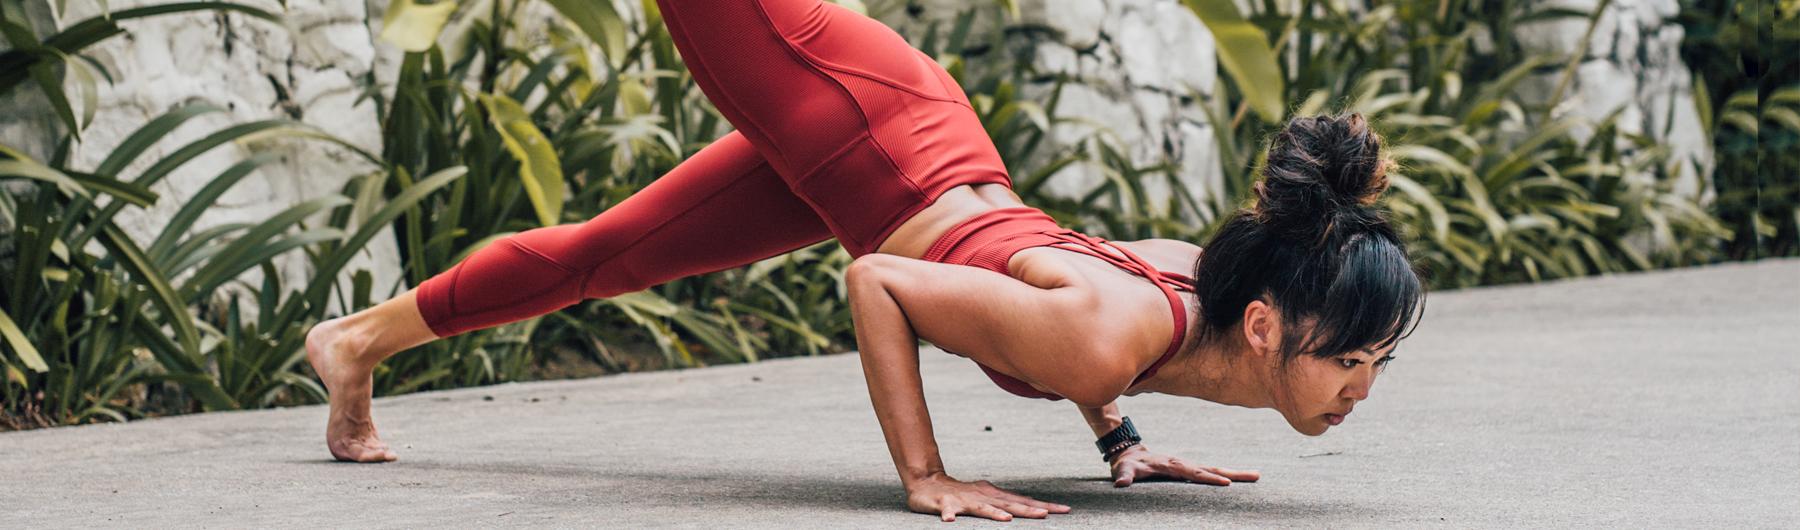 Rapha X Athlete Lab - Women's 100 Training Ride + Yoga | 7.00am, 13 Jul